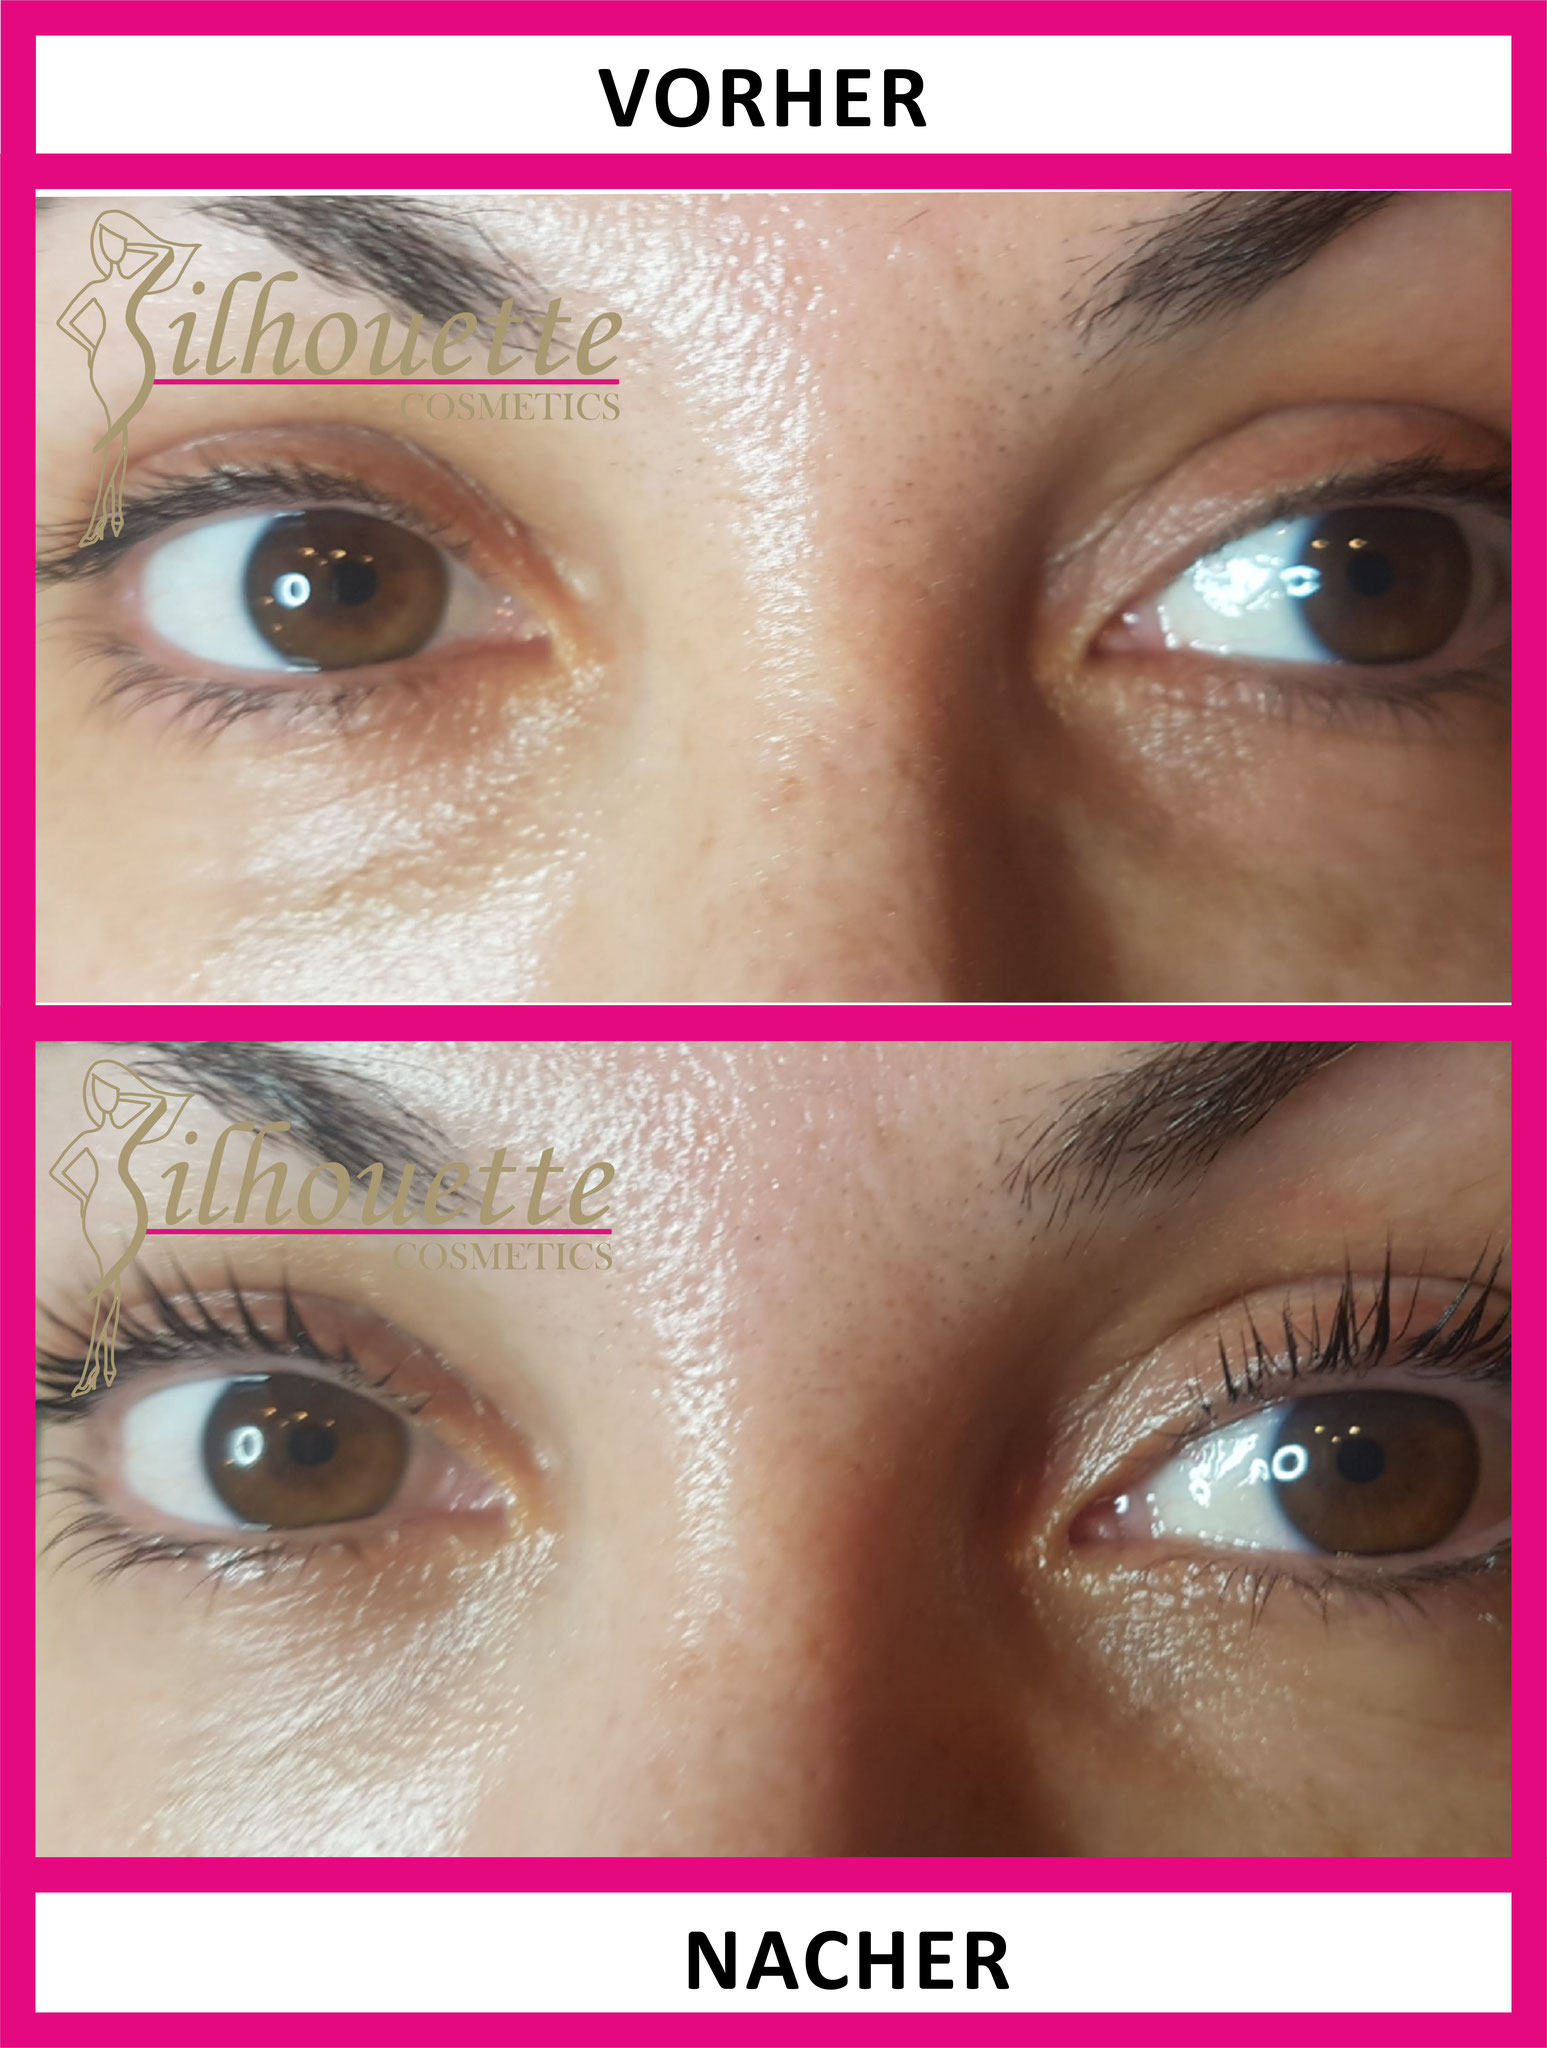 Wimpernwelle Silhouette Cosmetics Inviduelle Kosmetik Behandlungen